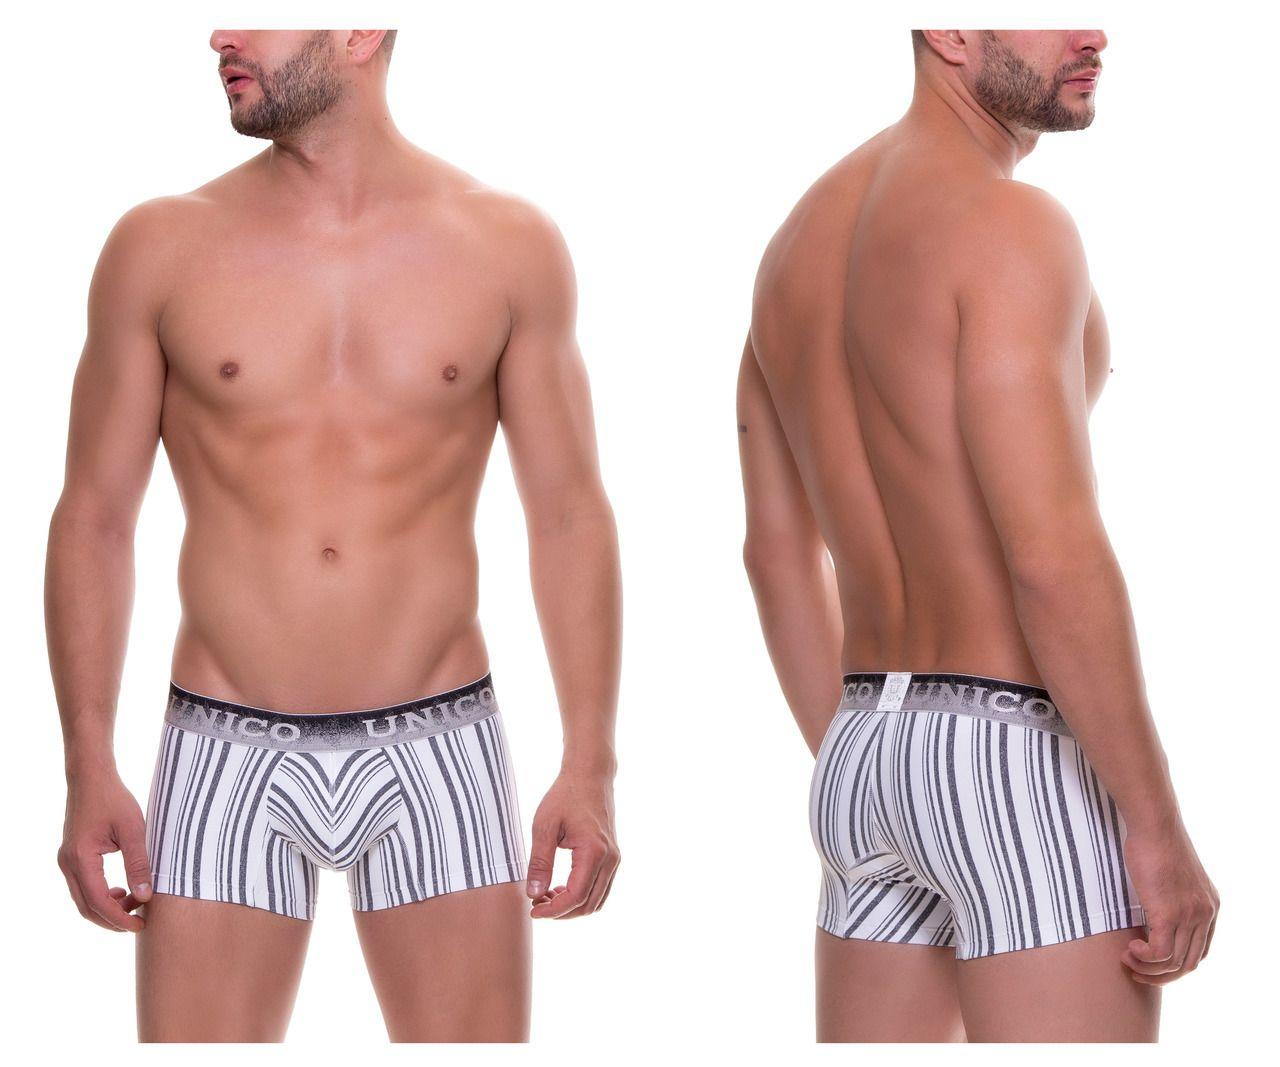 34362d6a50 1740082030 Unico Men s Boxer Briefs - Fetish Underwear Sales Ropa Interior